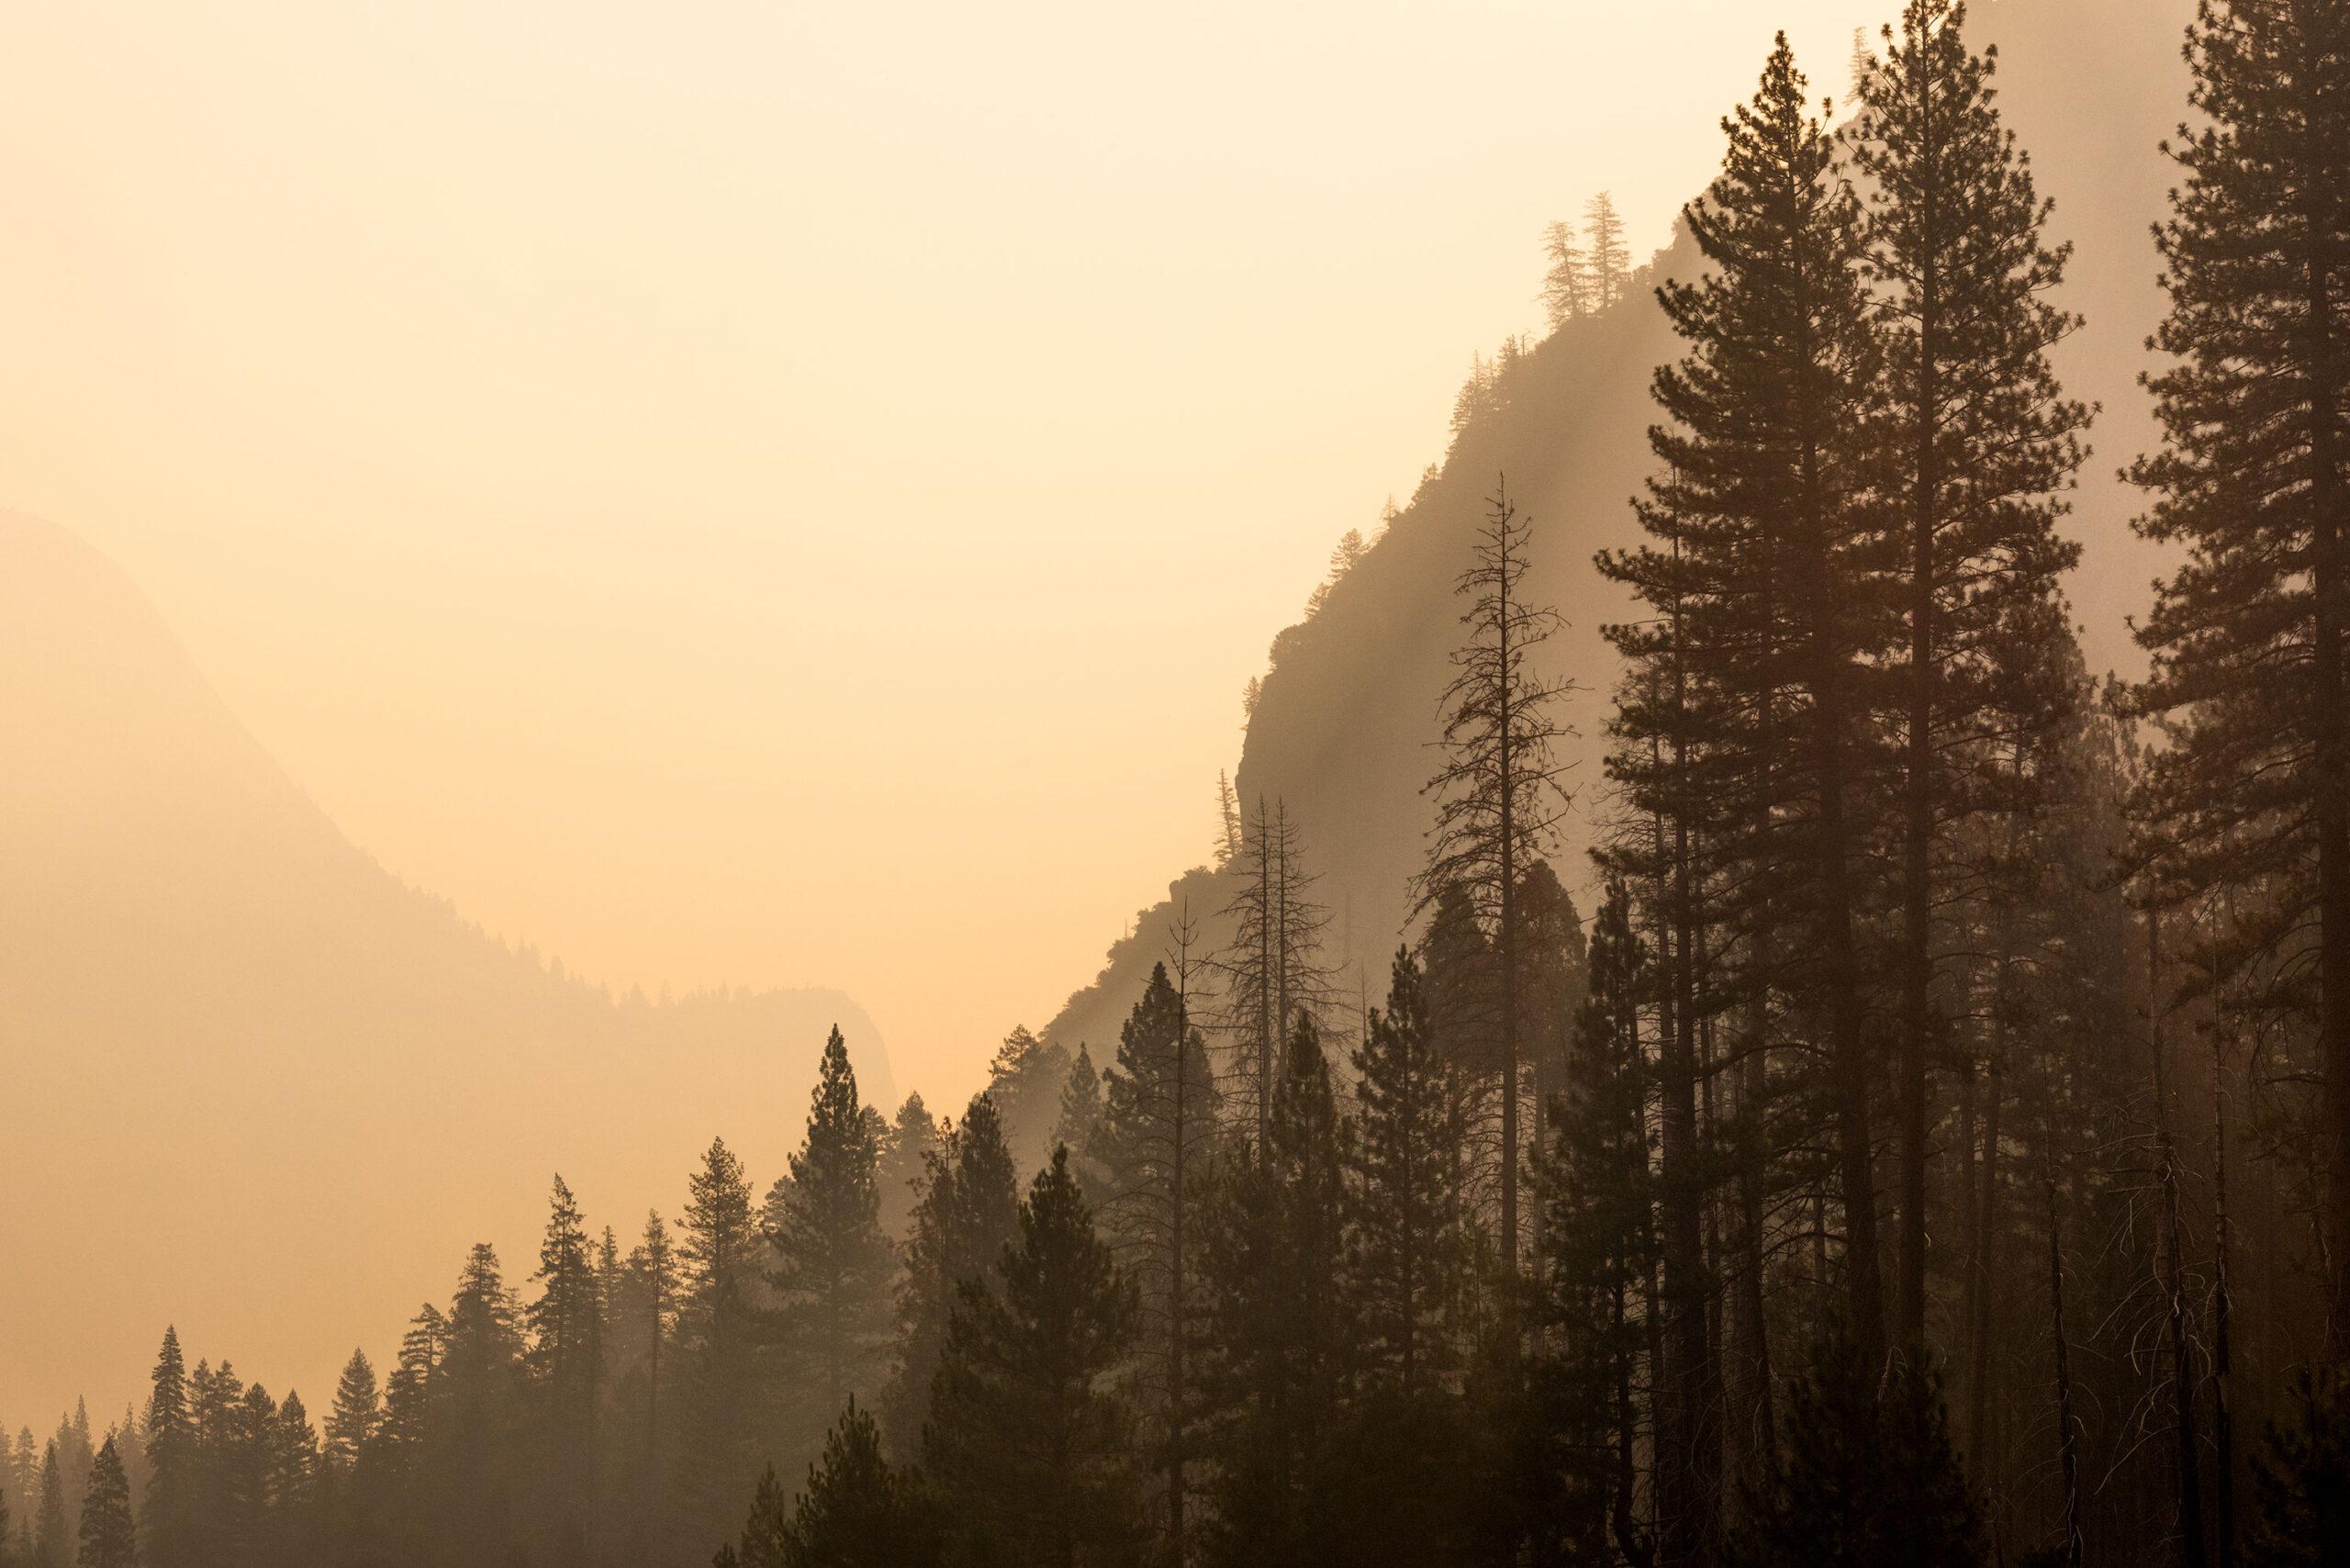 Sunrise photography of Yosemite forest taken by landscape photographer Jennifer Esseiva.